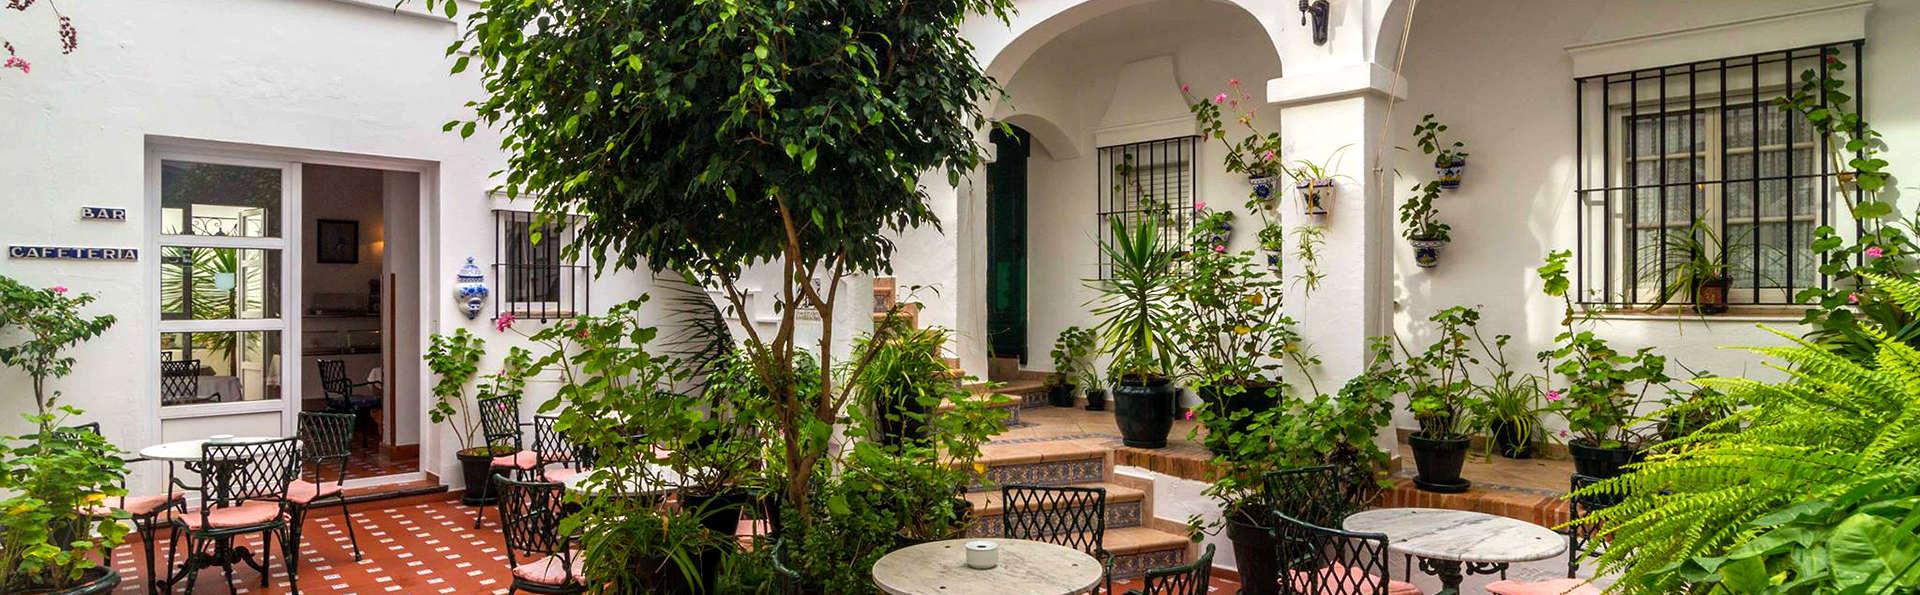 Hotel Los Olivos - Edit_Terrace.jpg